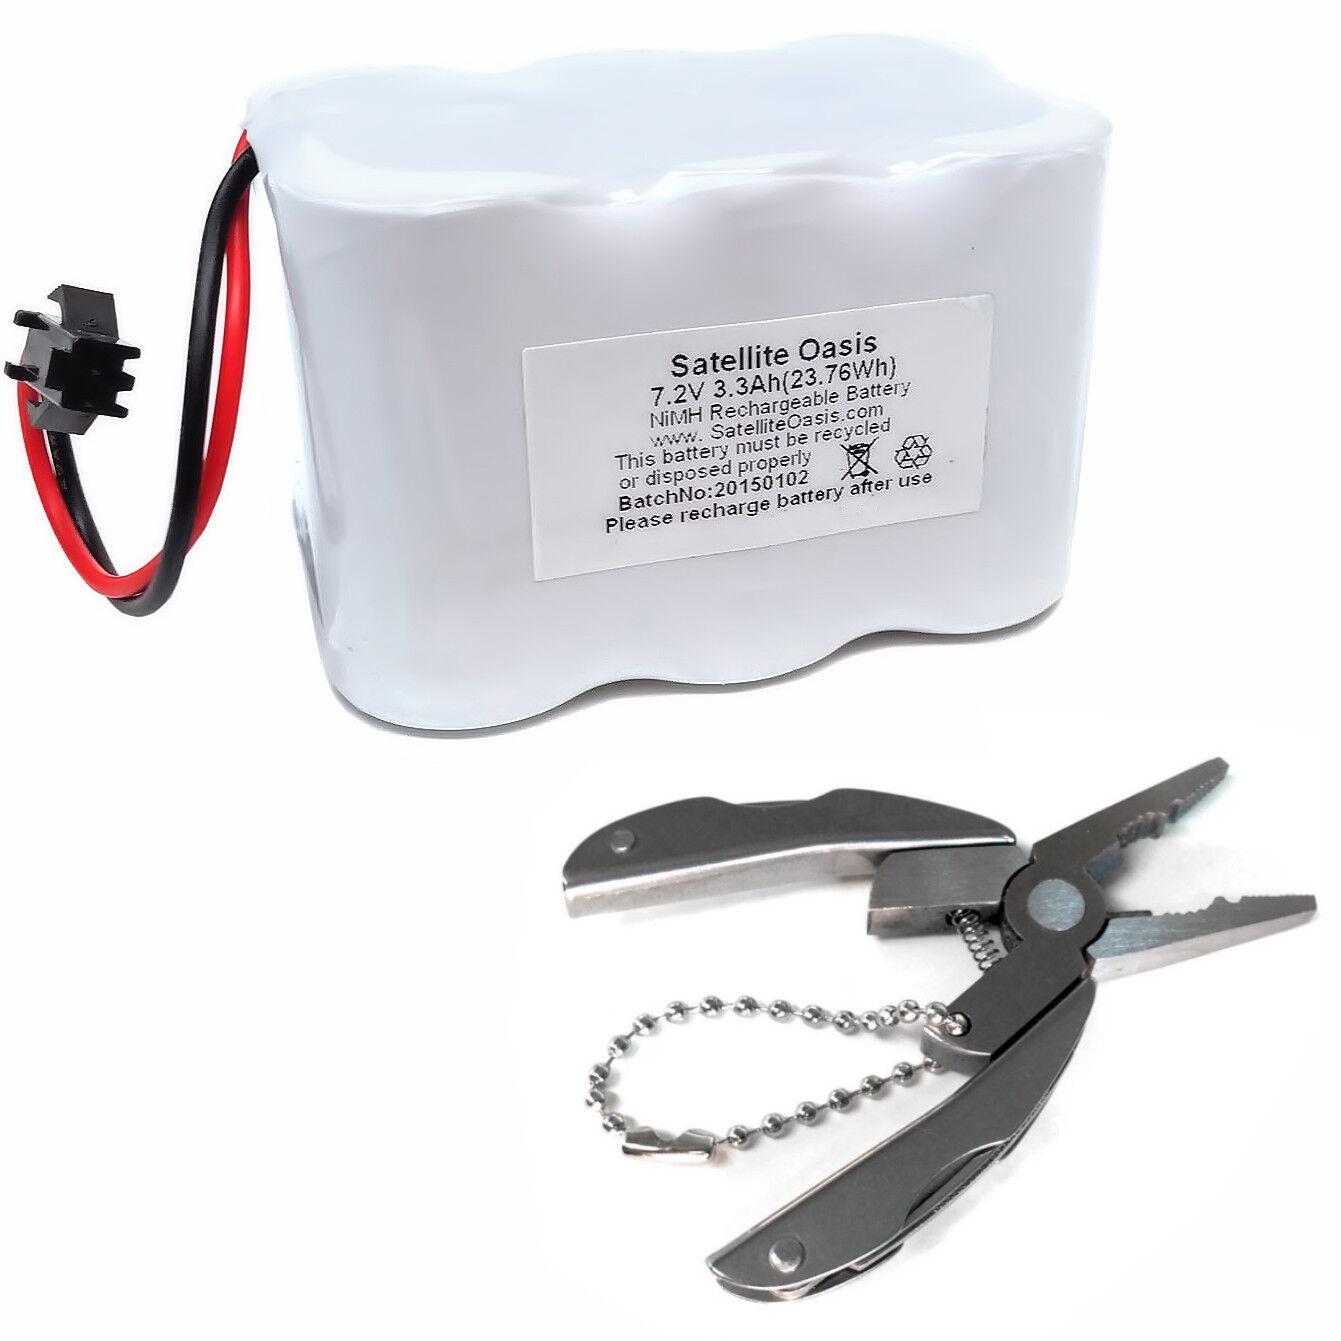 Birdog Usb Satellite Finder Meter Battery 2.5 / 3 / 4 Bir...